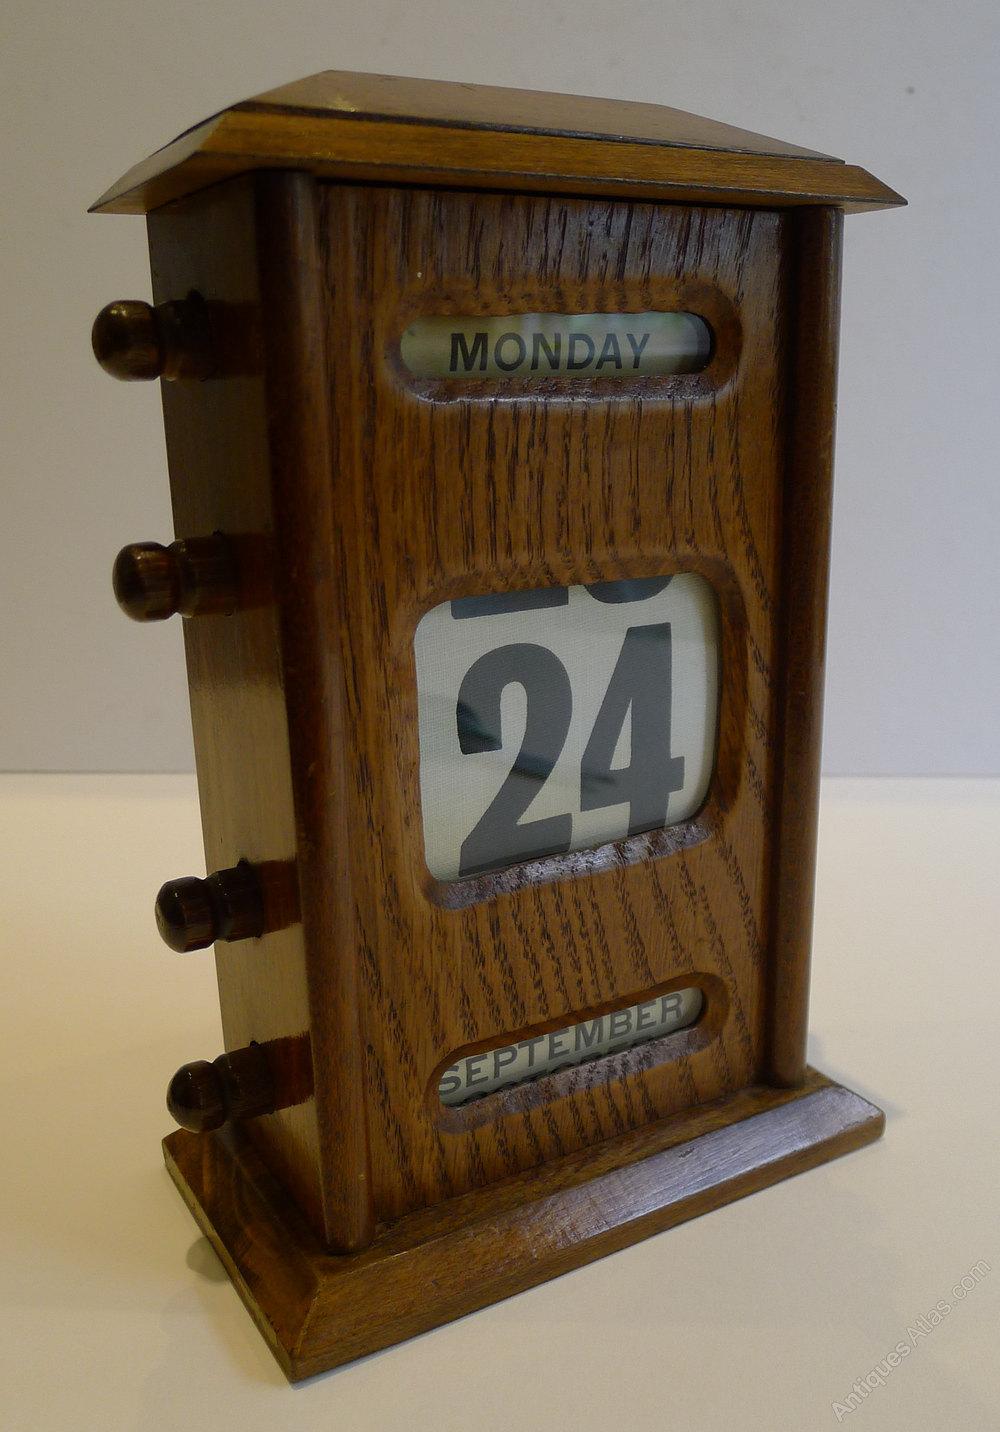 Large Antique English Oak Perpetual Desk Calendar Antique Desk Furniture /  Accessories Antique English Perpetual %%alt5%% %%alt6%% - Antiques Atlas - Large Antique English Oak Perpetual Desk Calendar